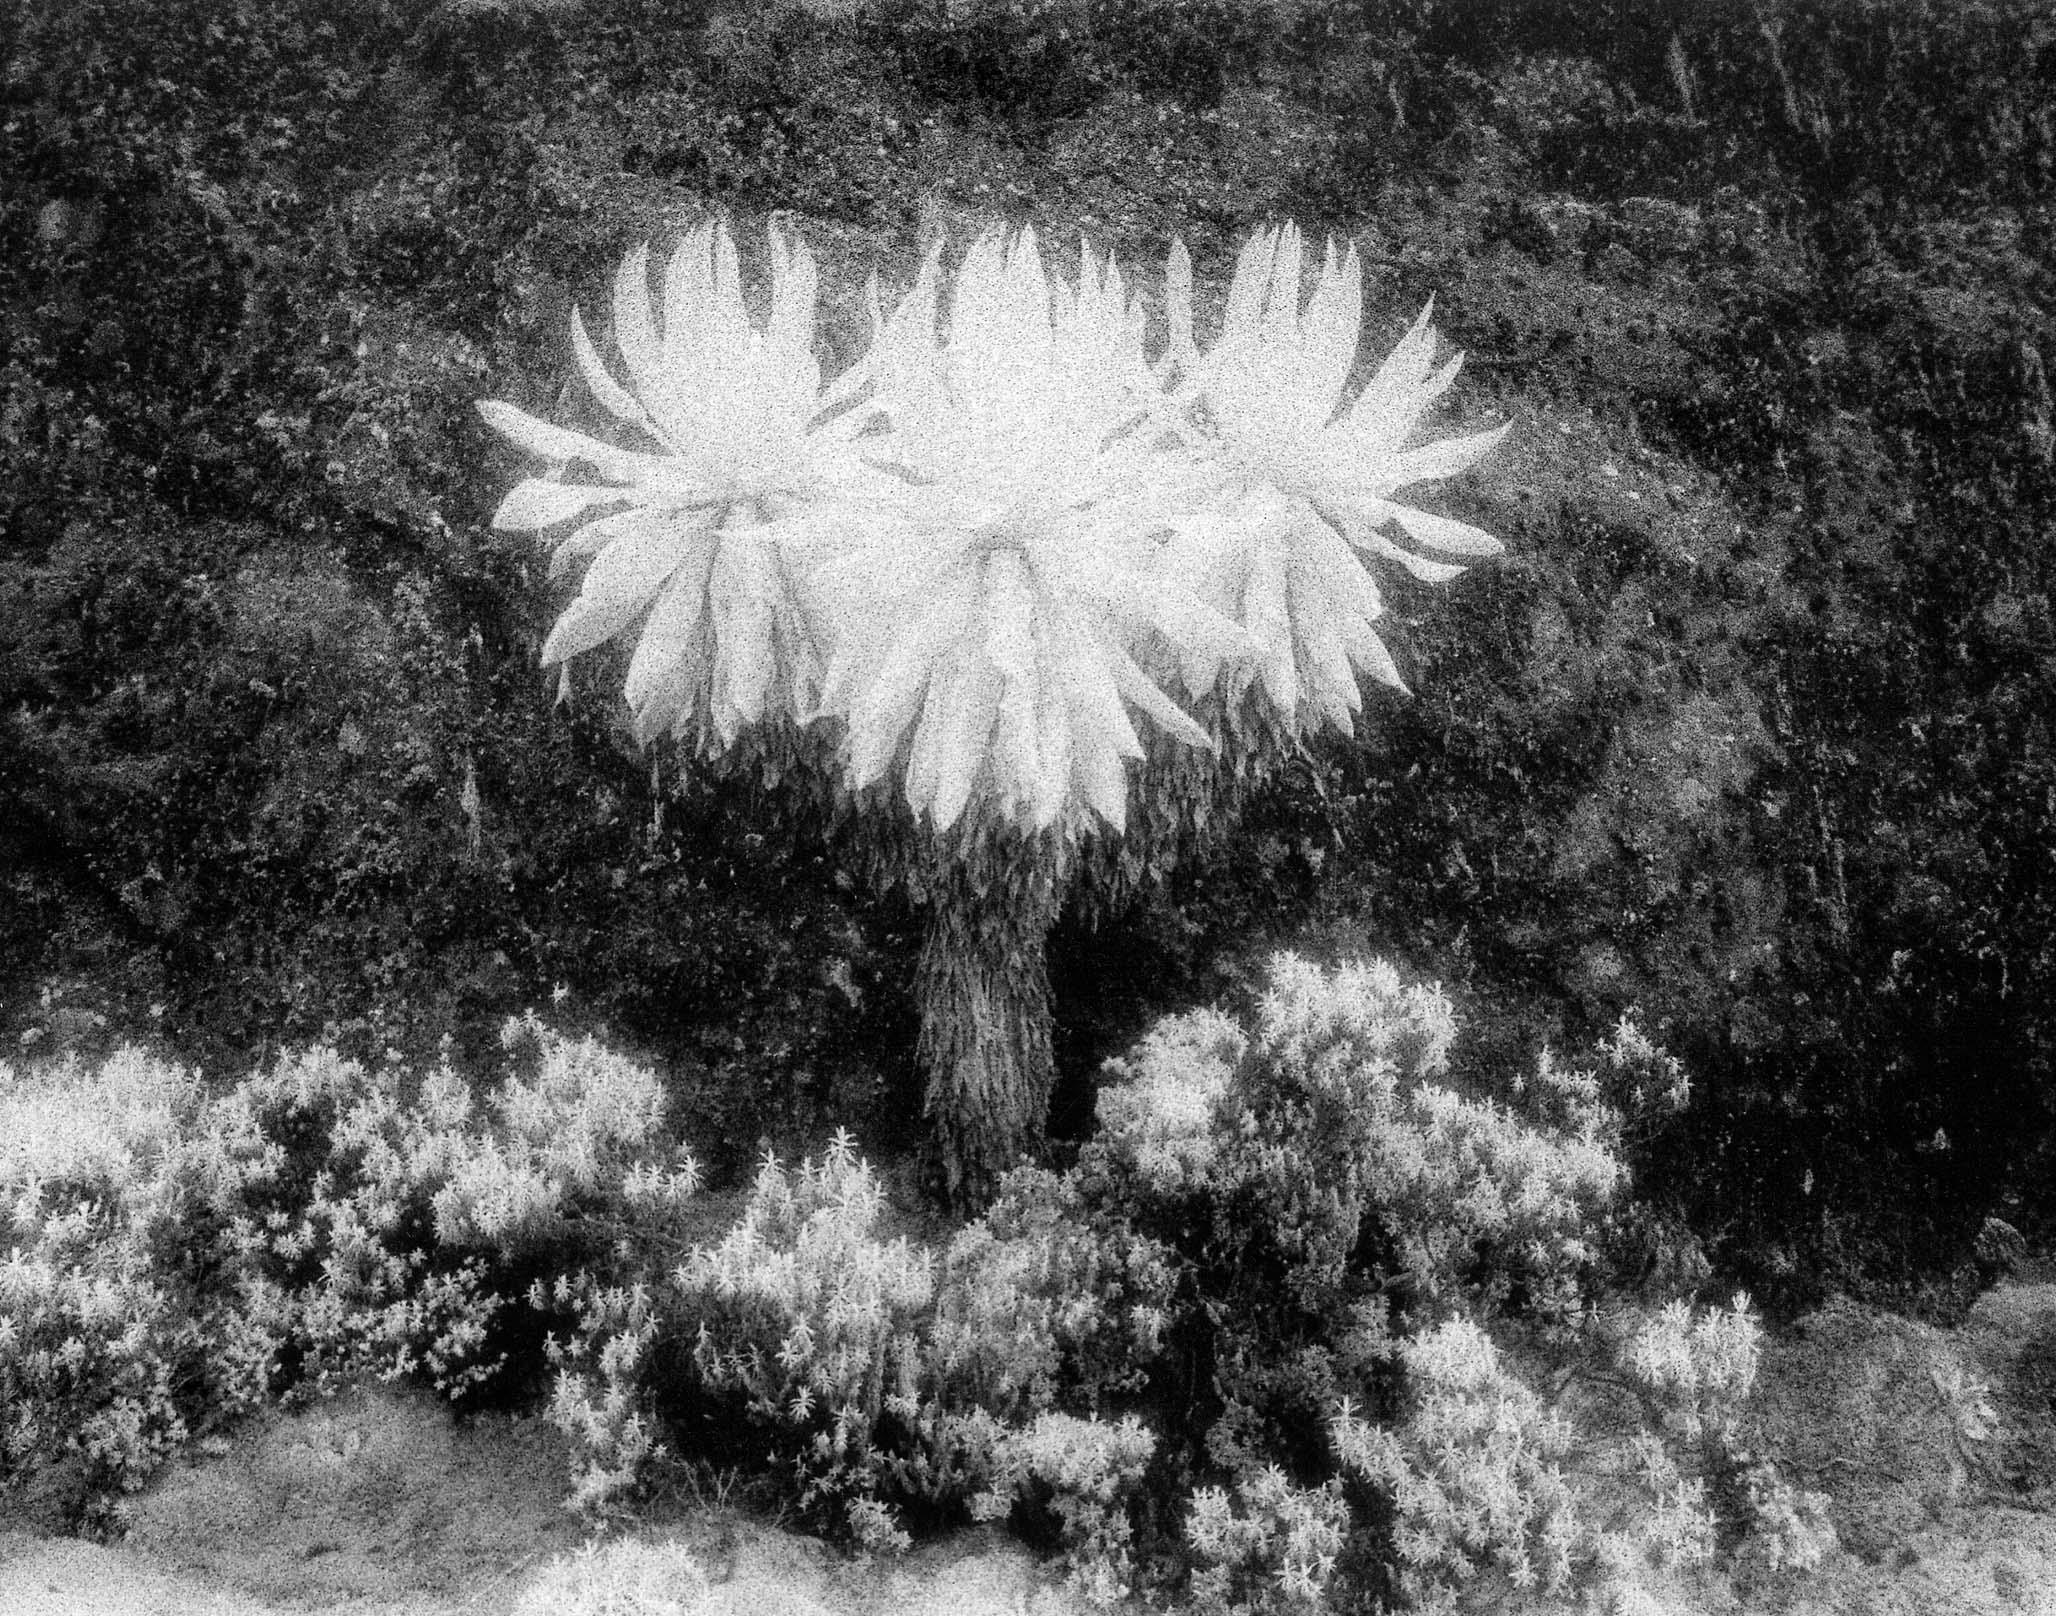 Flowers of the Monn